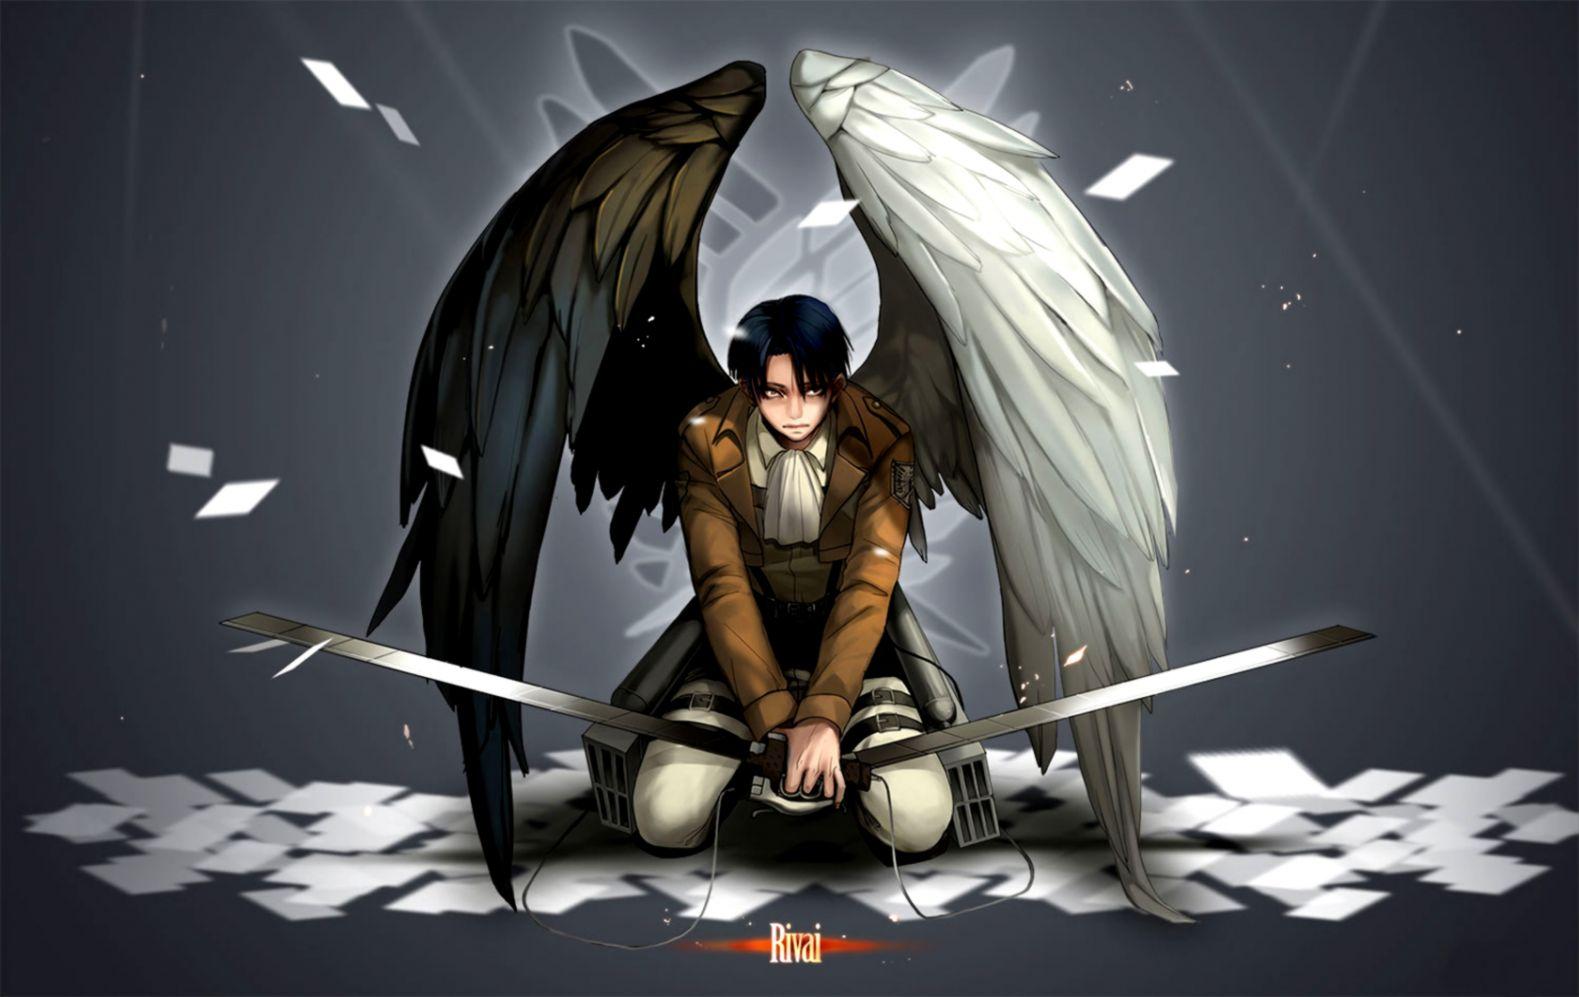 Anime Angel Wings Wallpaper 2015 Hd Mobile Wallpapers